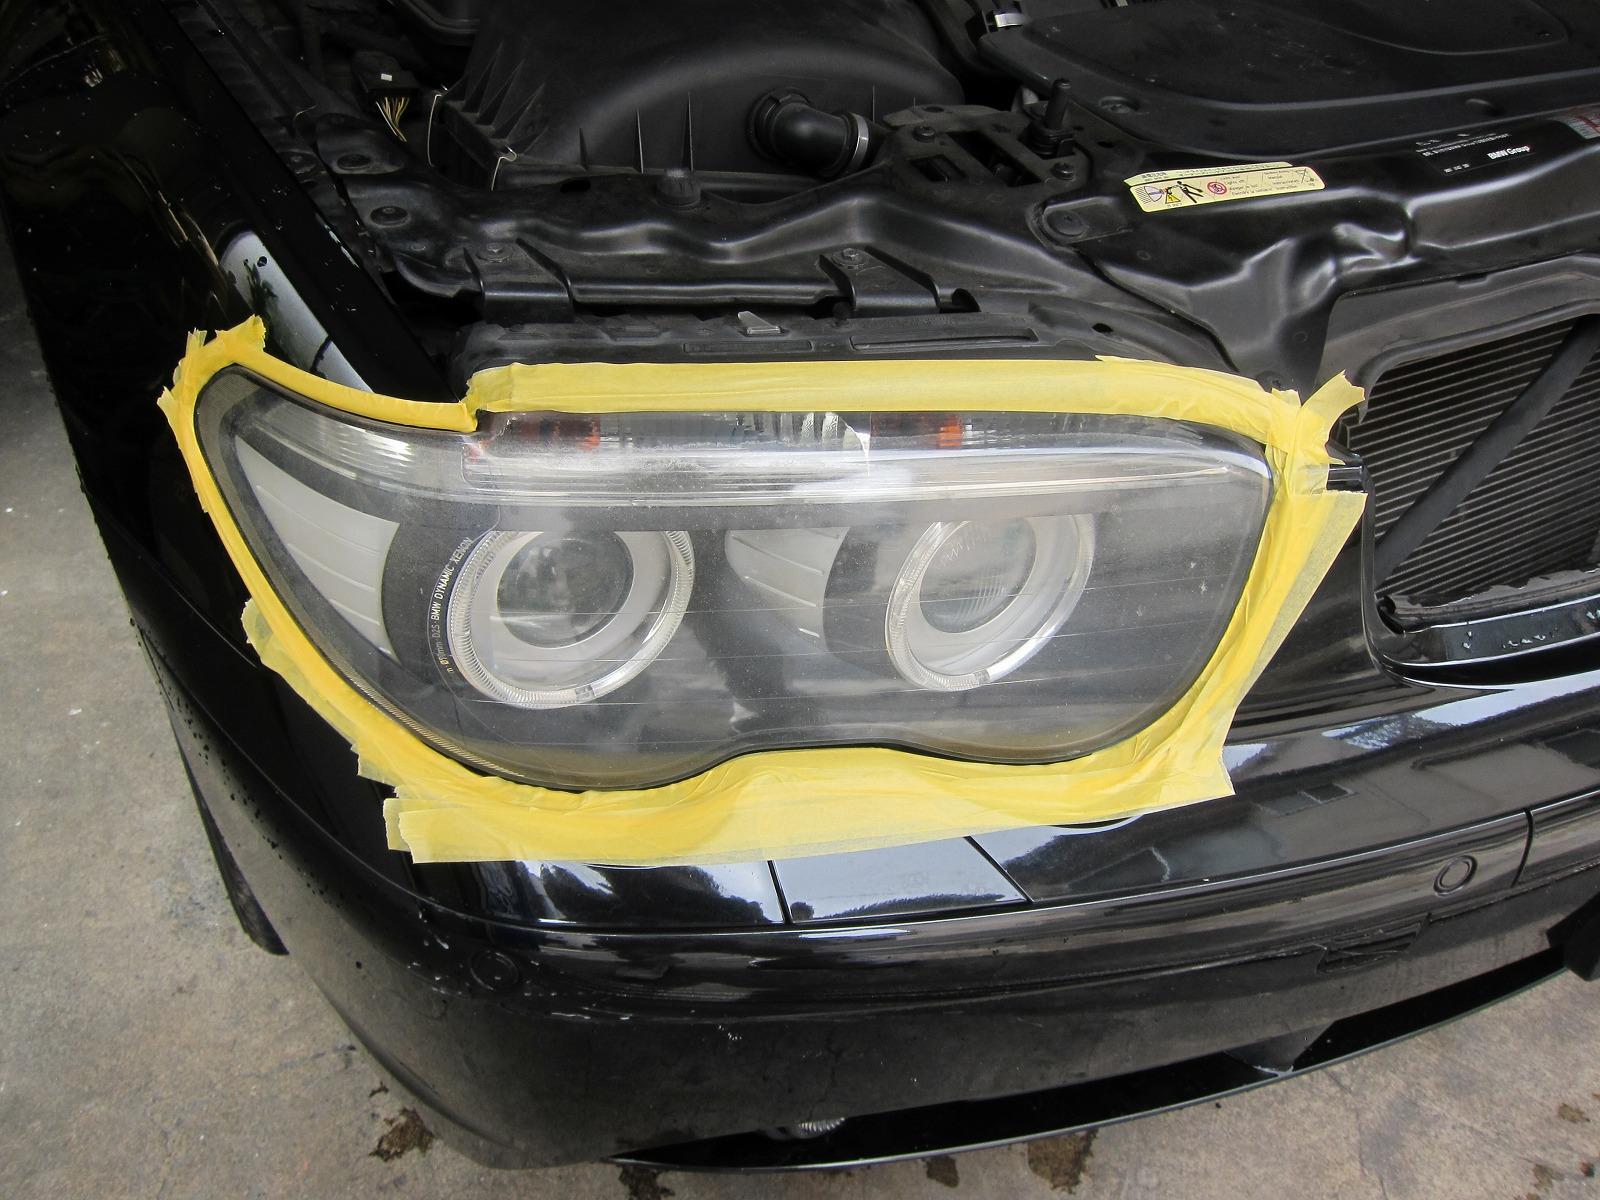 20160518bmw-745i-headlight-cleaning-06